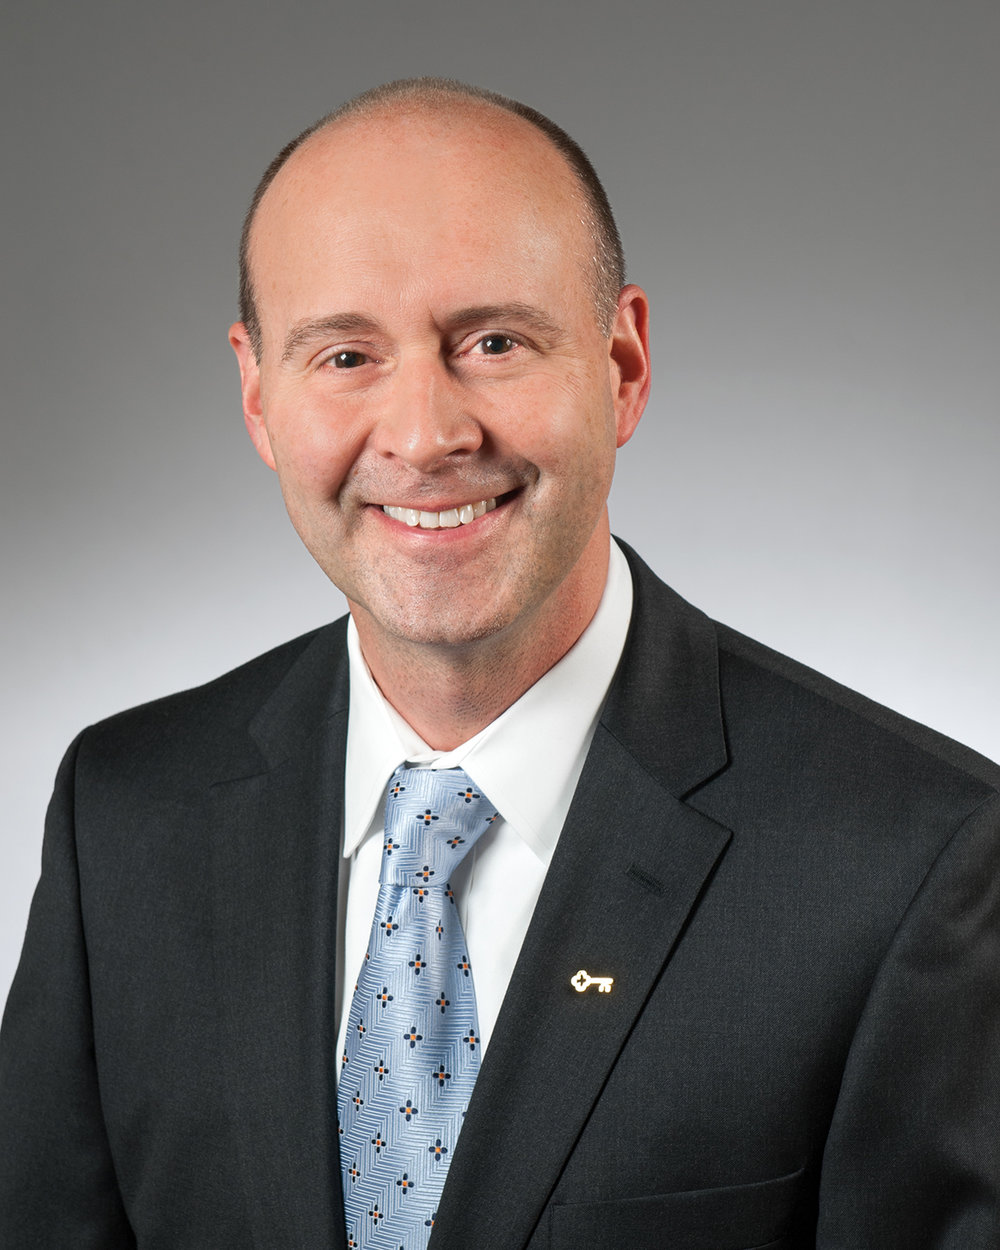 George K. Mateyo <br /> Chief Investment Officer <br /> KeyBank